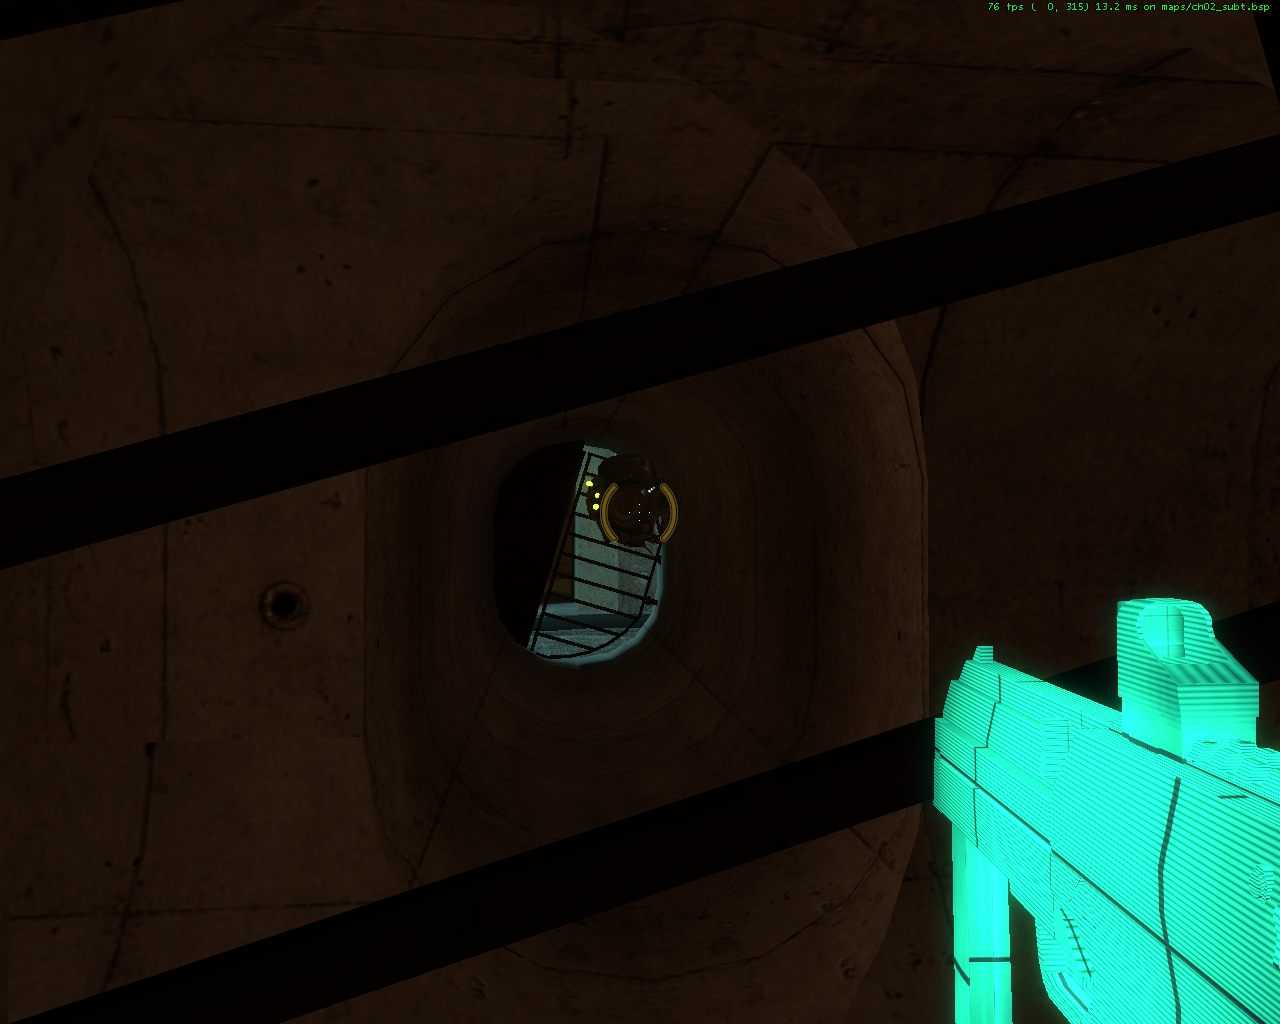 ch02_subt0084.jpg - Half-Life 2 ch02_subt, Dark Interval, Dark Interval: Part 1